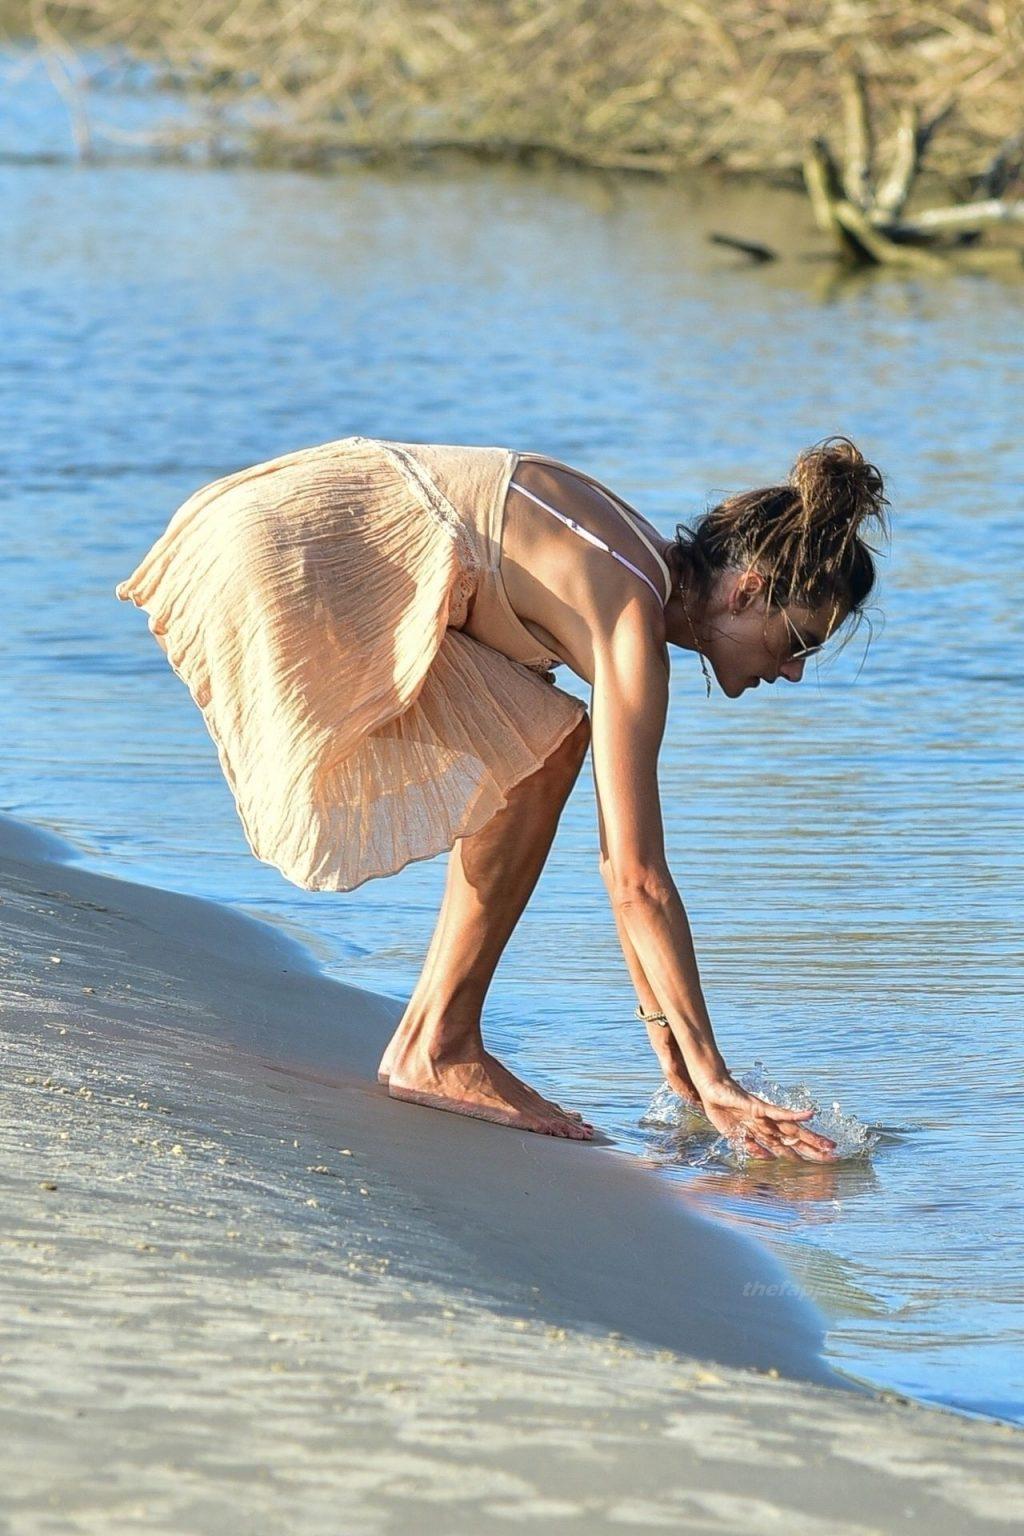 Alessandra Ambrosio Poses For Her Swimwear Brand (72 Photos)